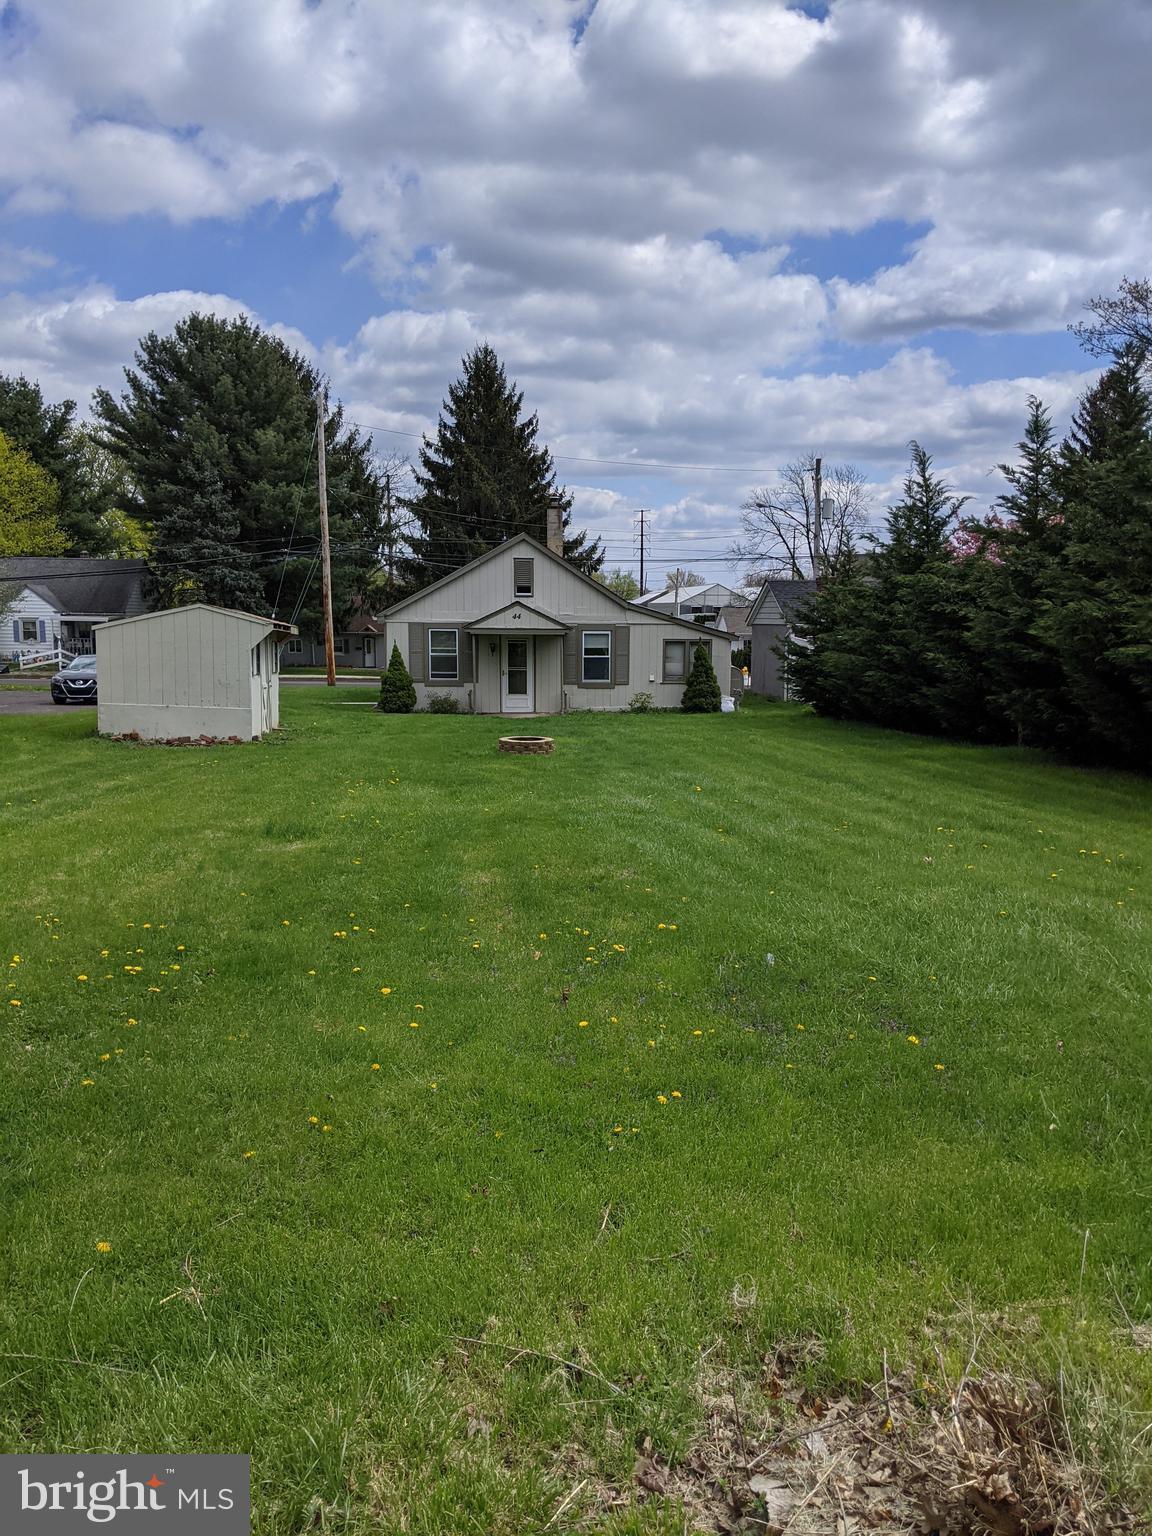 44 LAMBERT STREET, HATFIELD, Pennsylvania 19440, ,Lots And Land,For Sale,44 LAMBERT STREET,PAMC691400